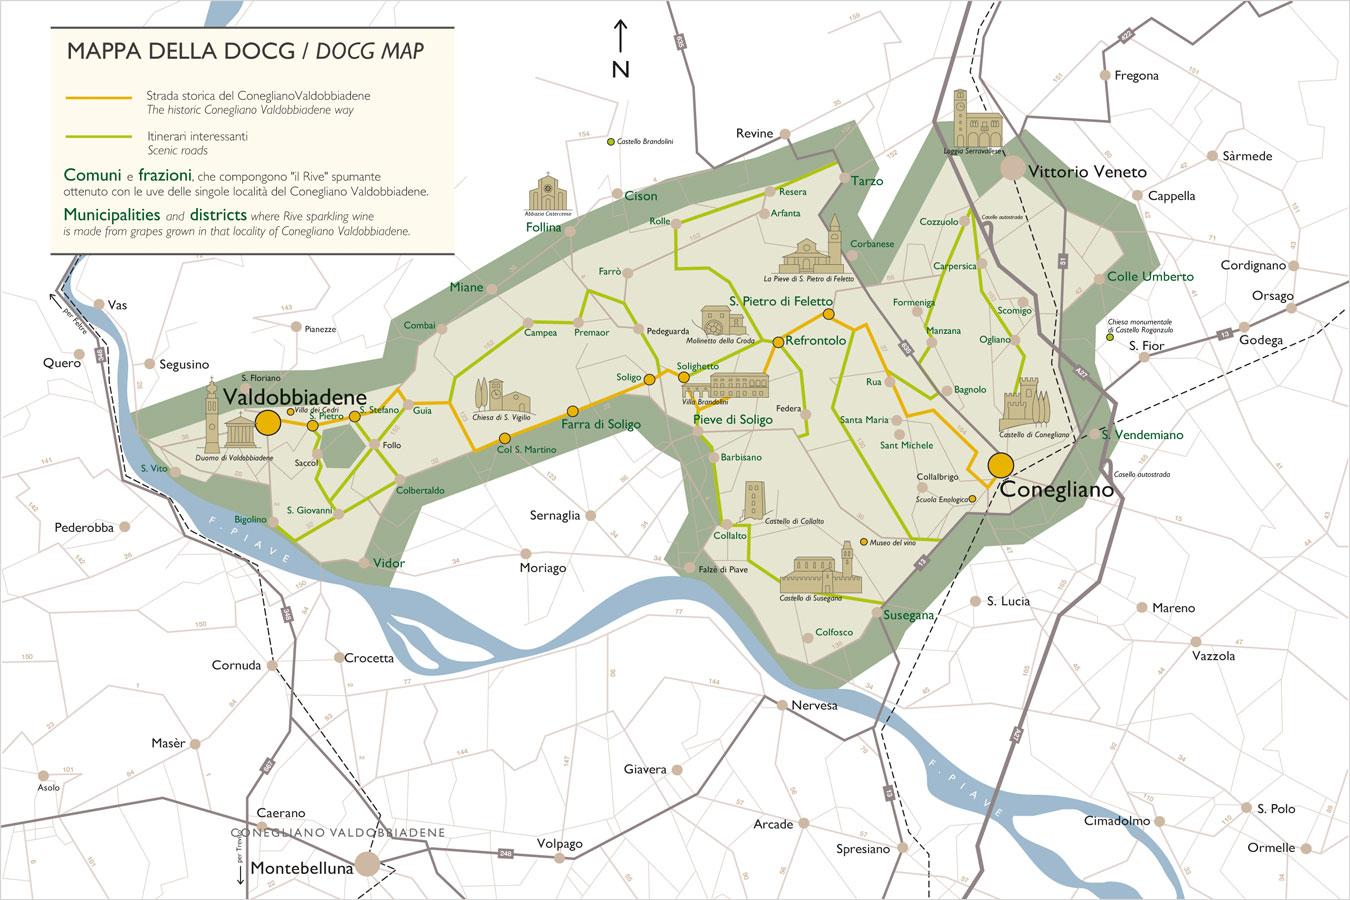 DOC and DOCG Zones